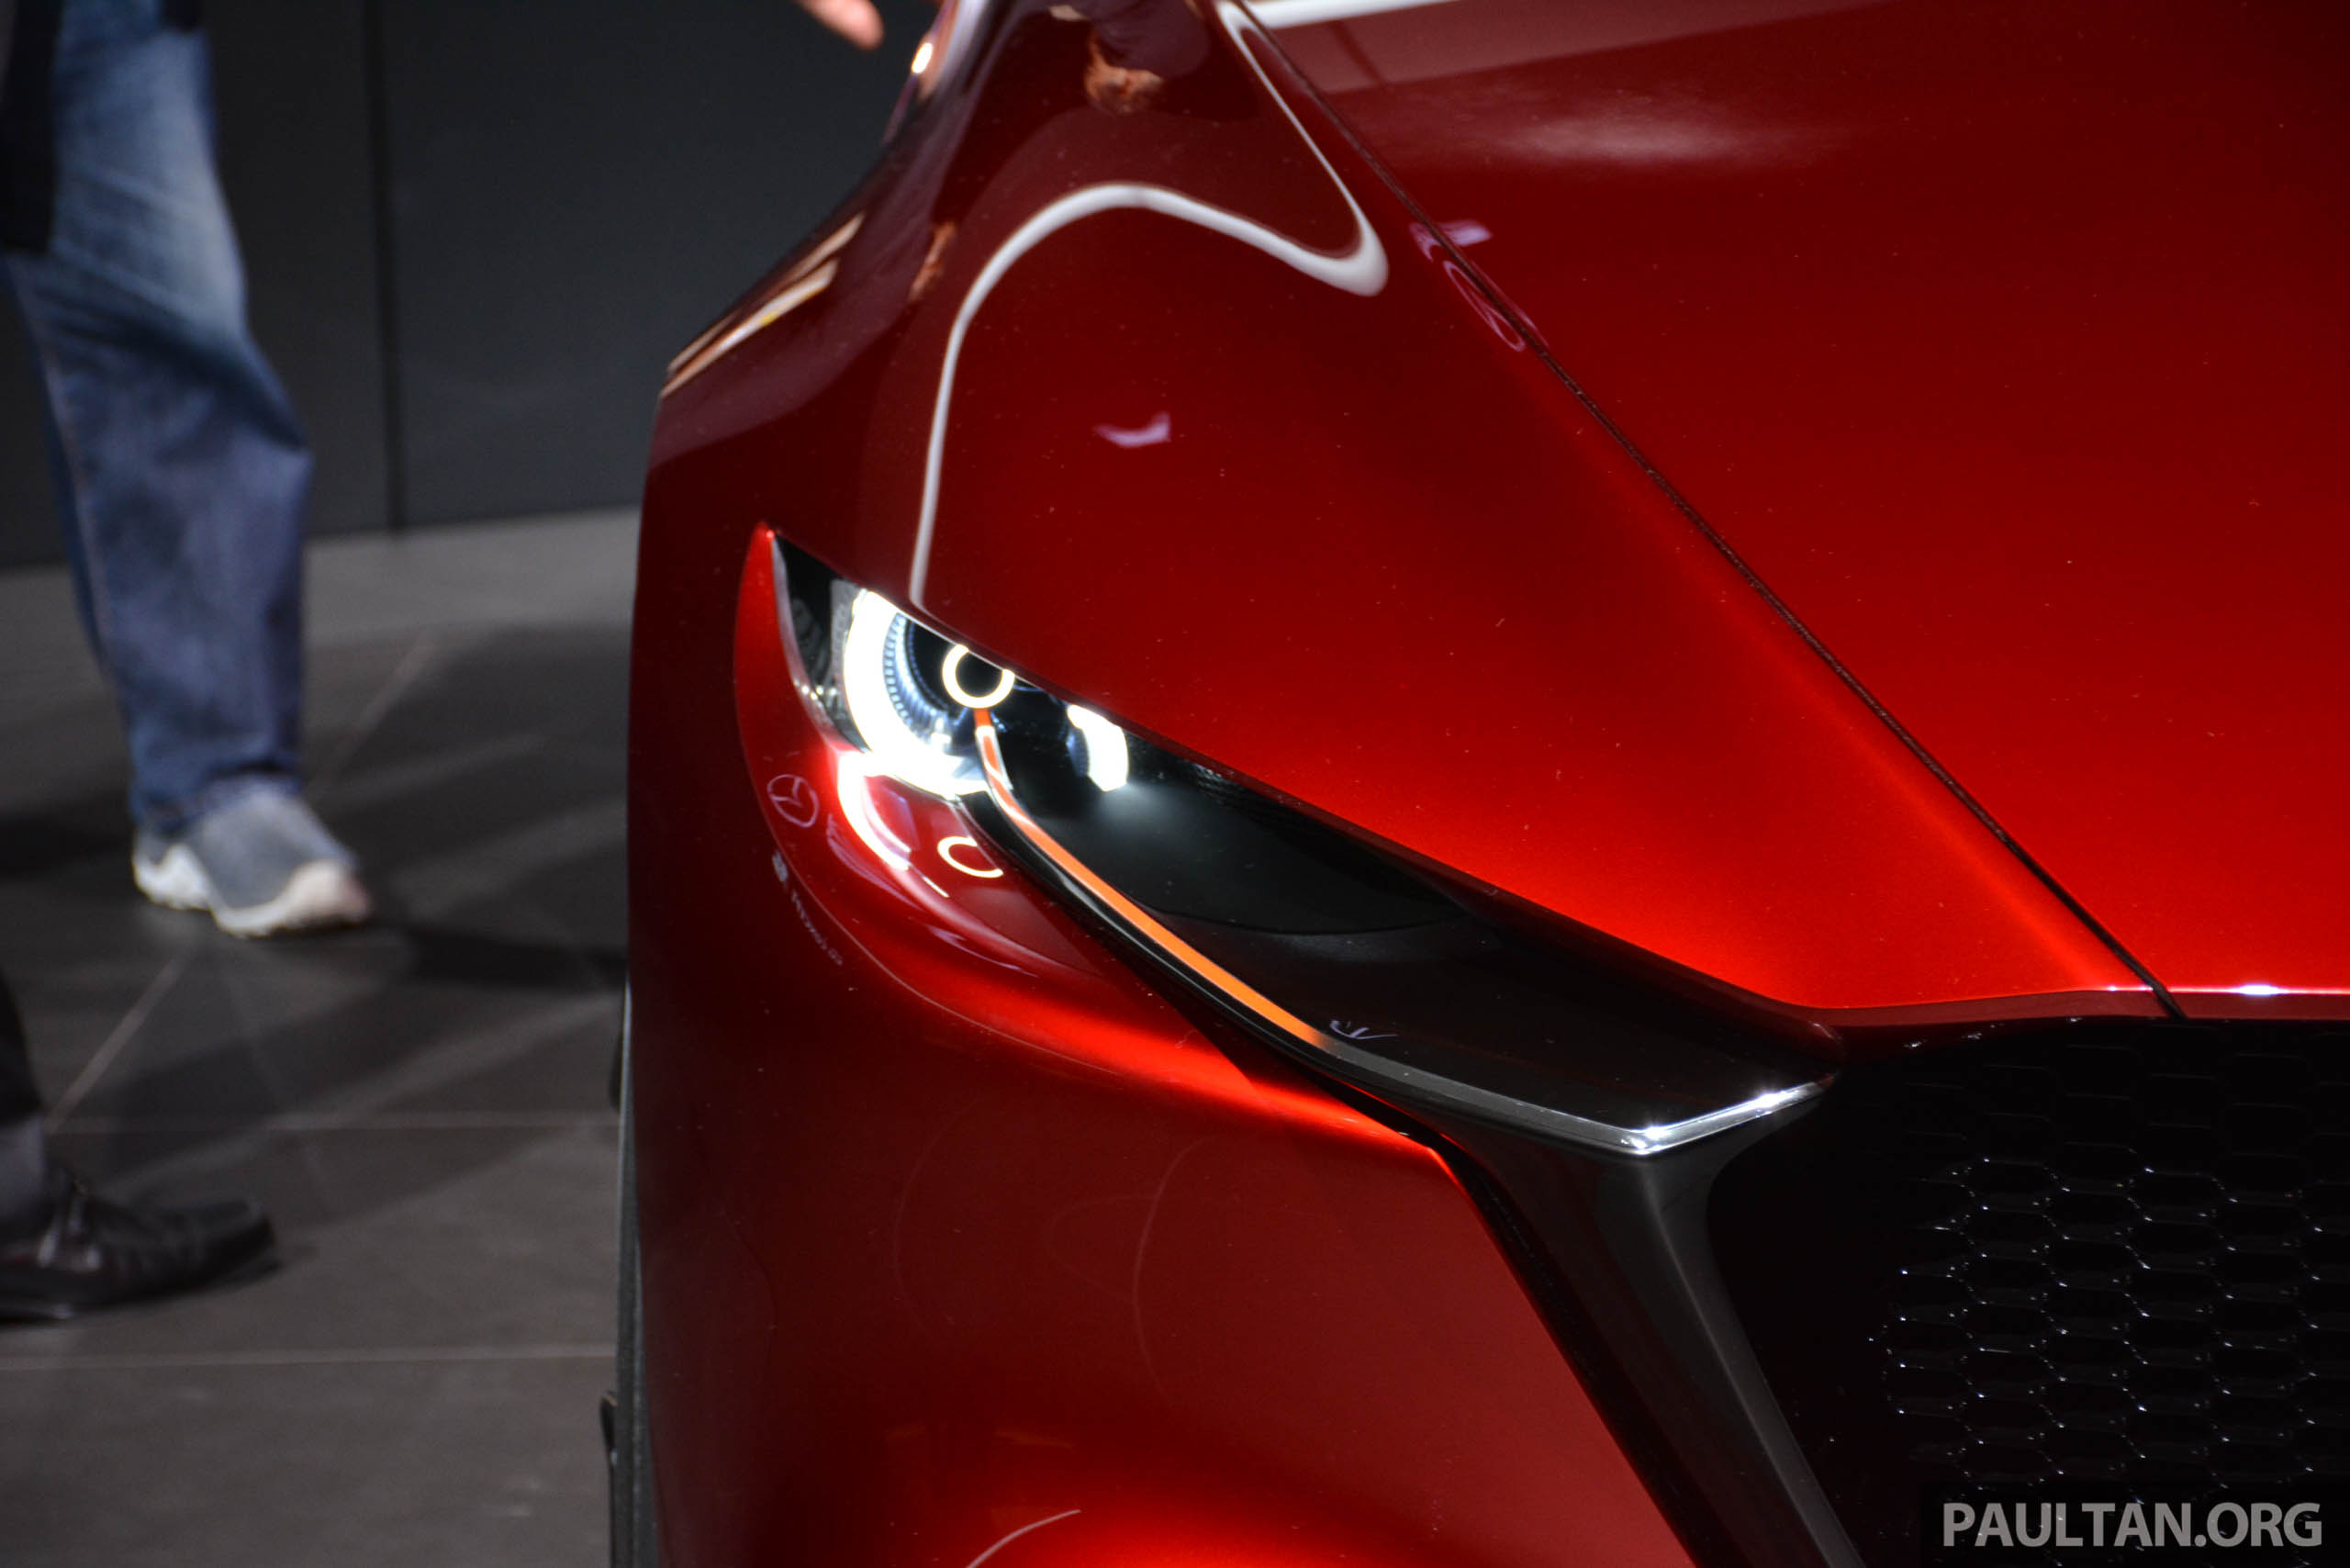 https://s1.paultan.org/image/2017/10/Mazda-Kai-Concept-TMS2017-7.jpg